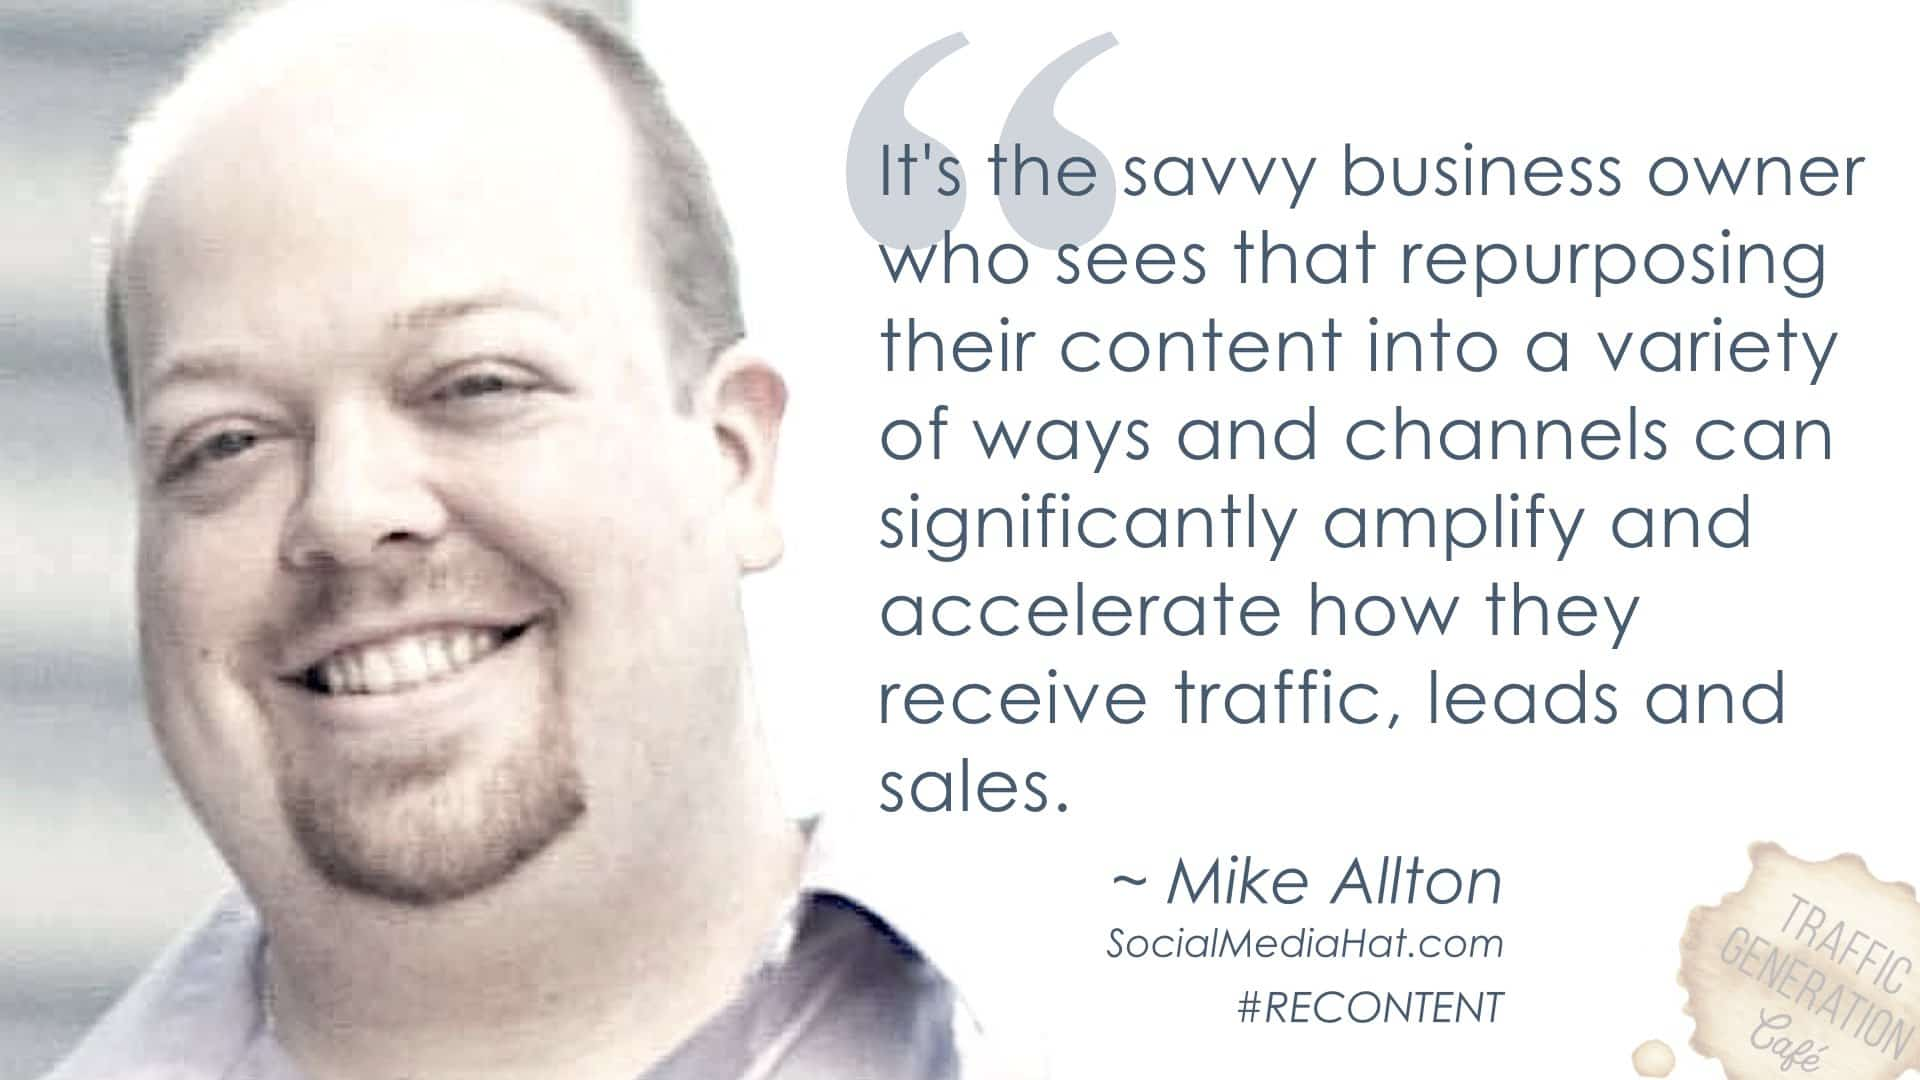 content repurposing by Mike Allton